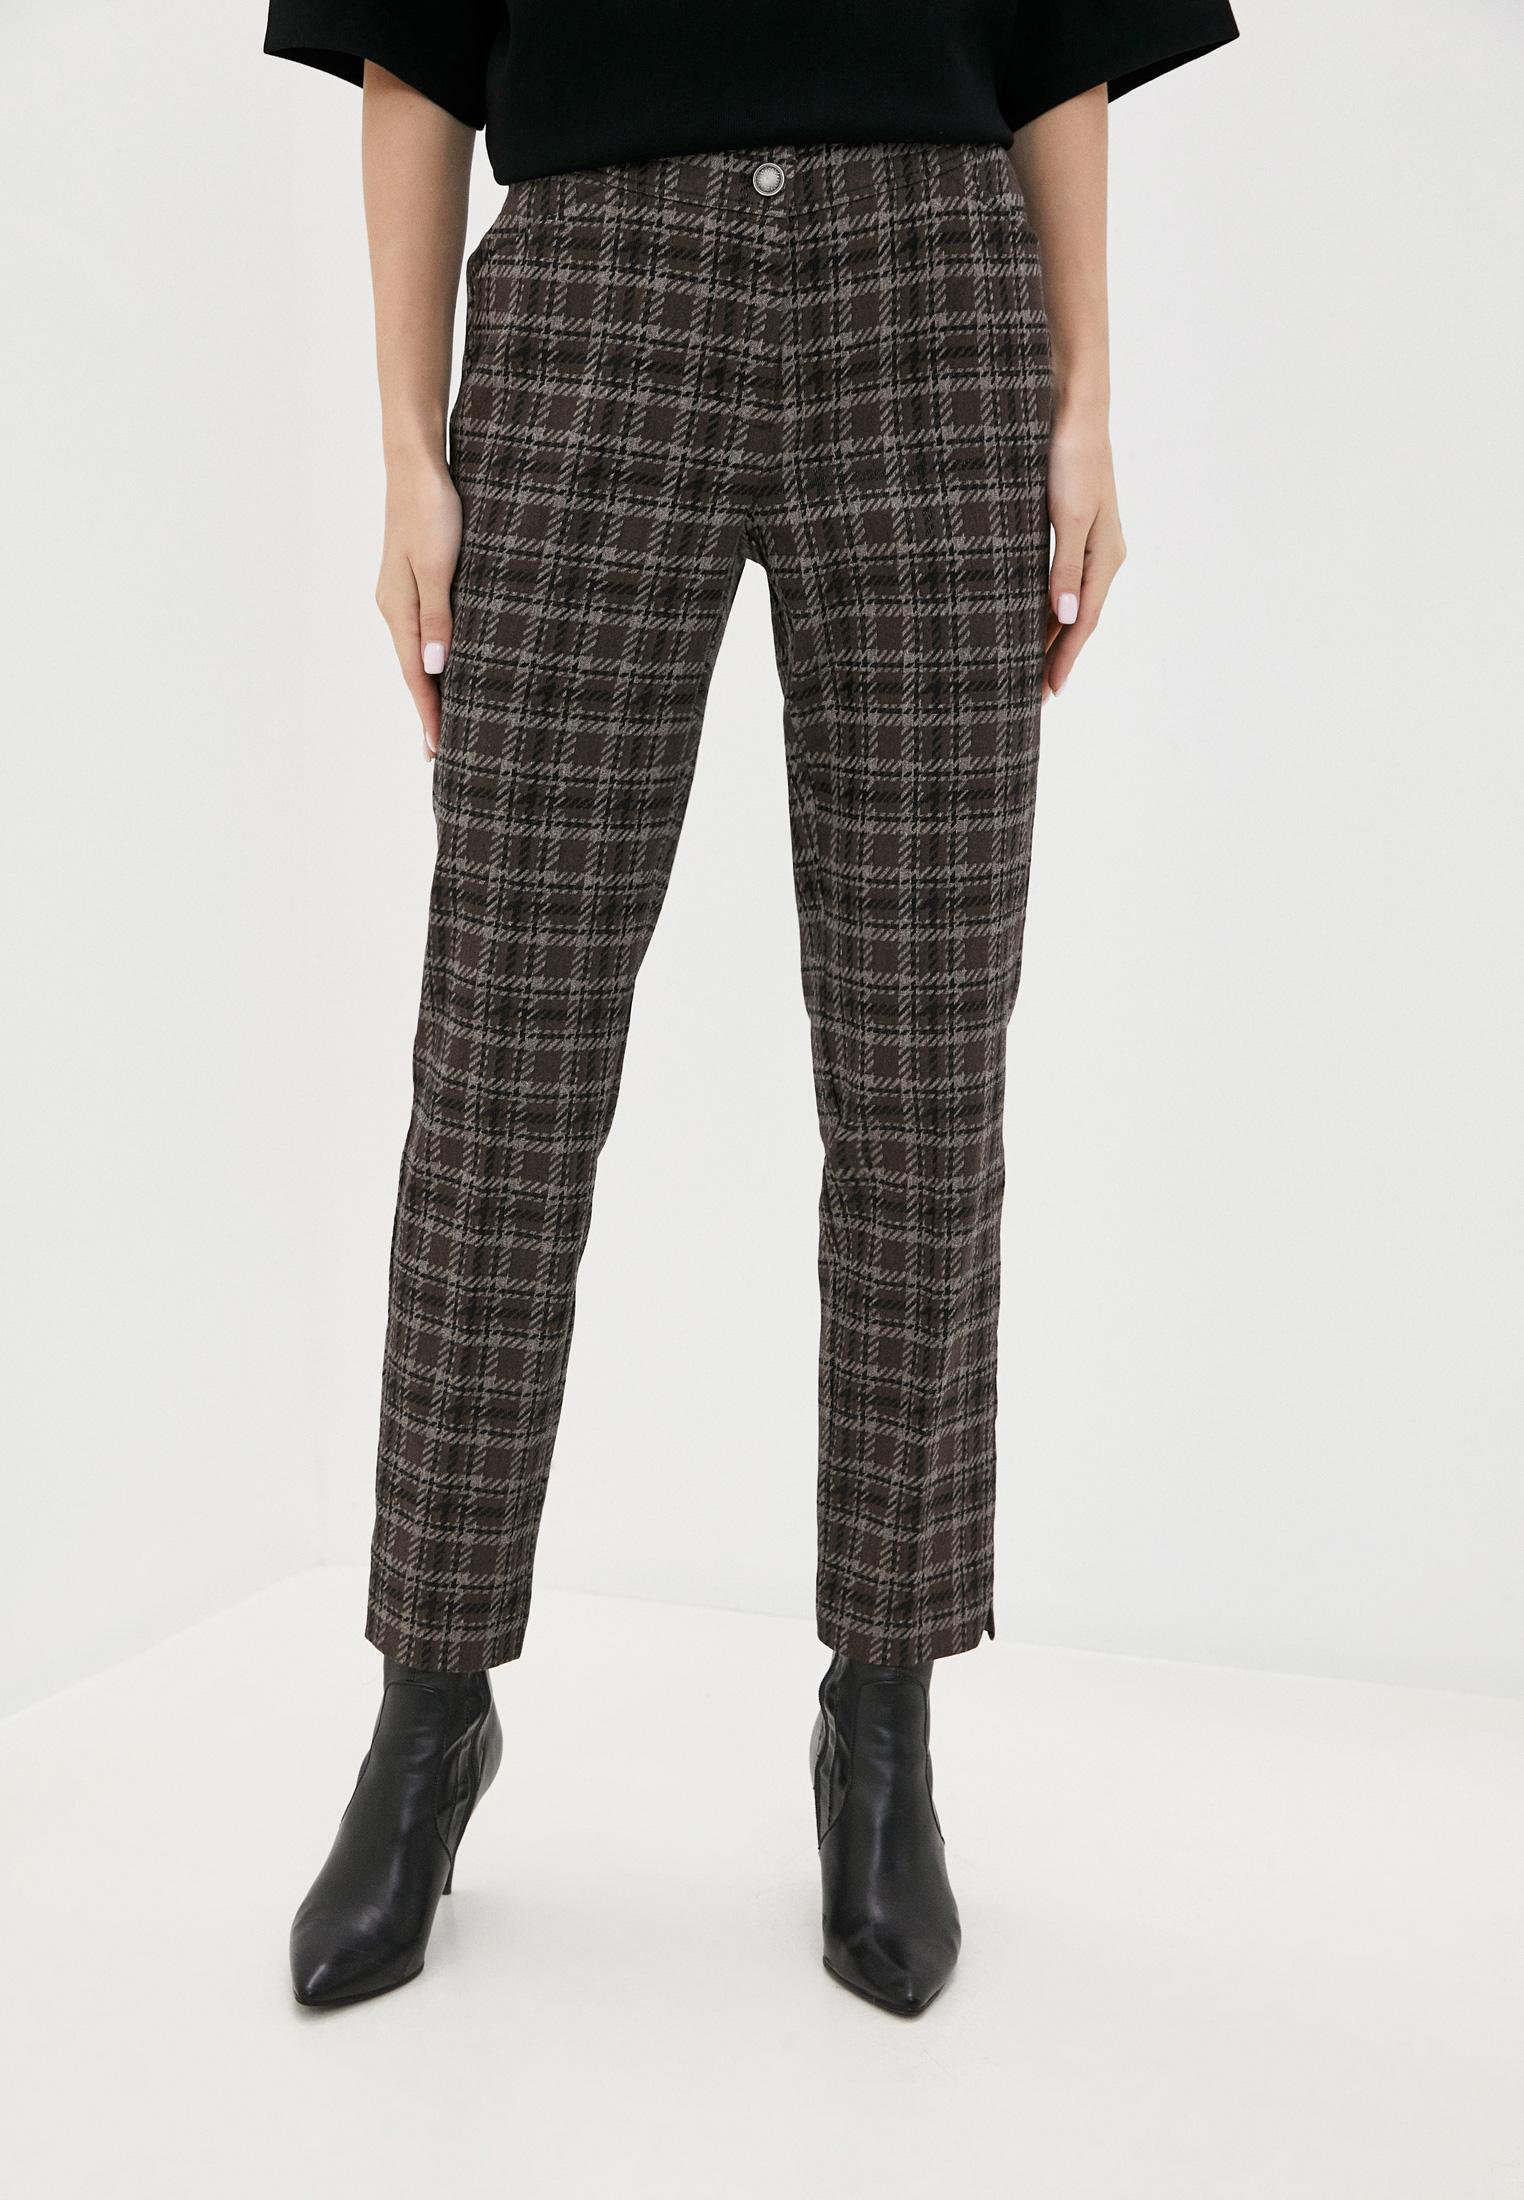 Женские прямые брюки Betty Barclay 6158/1797